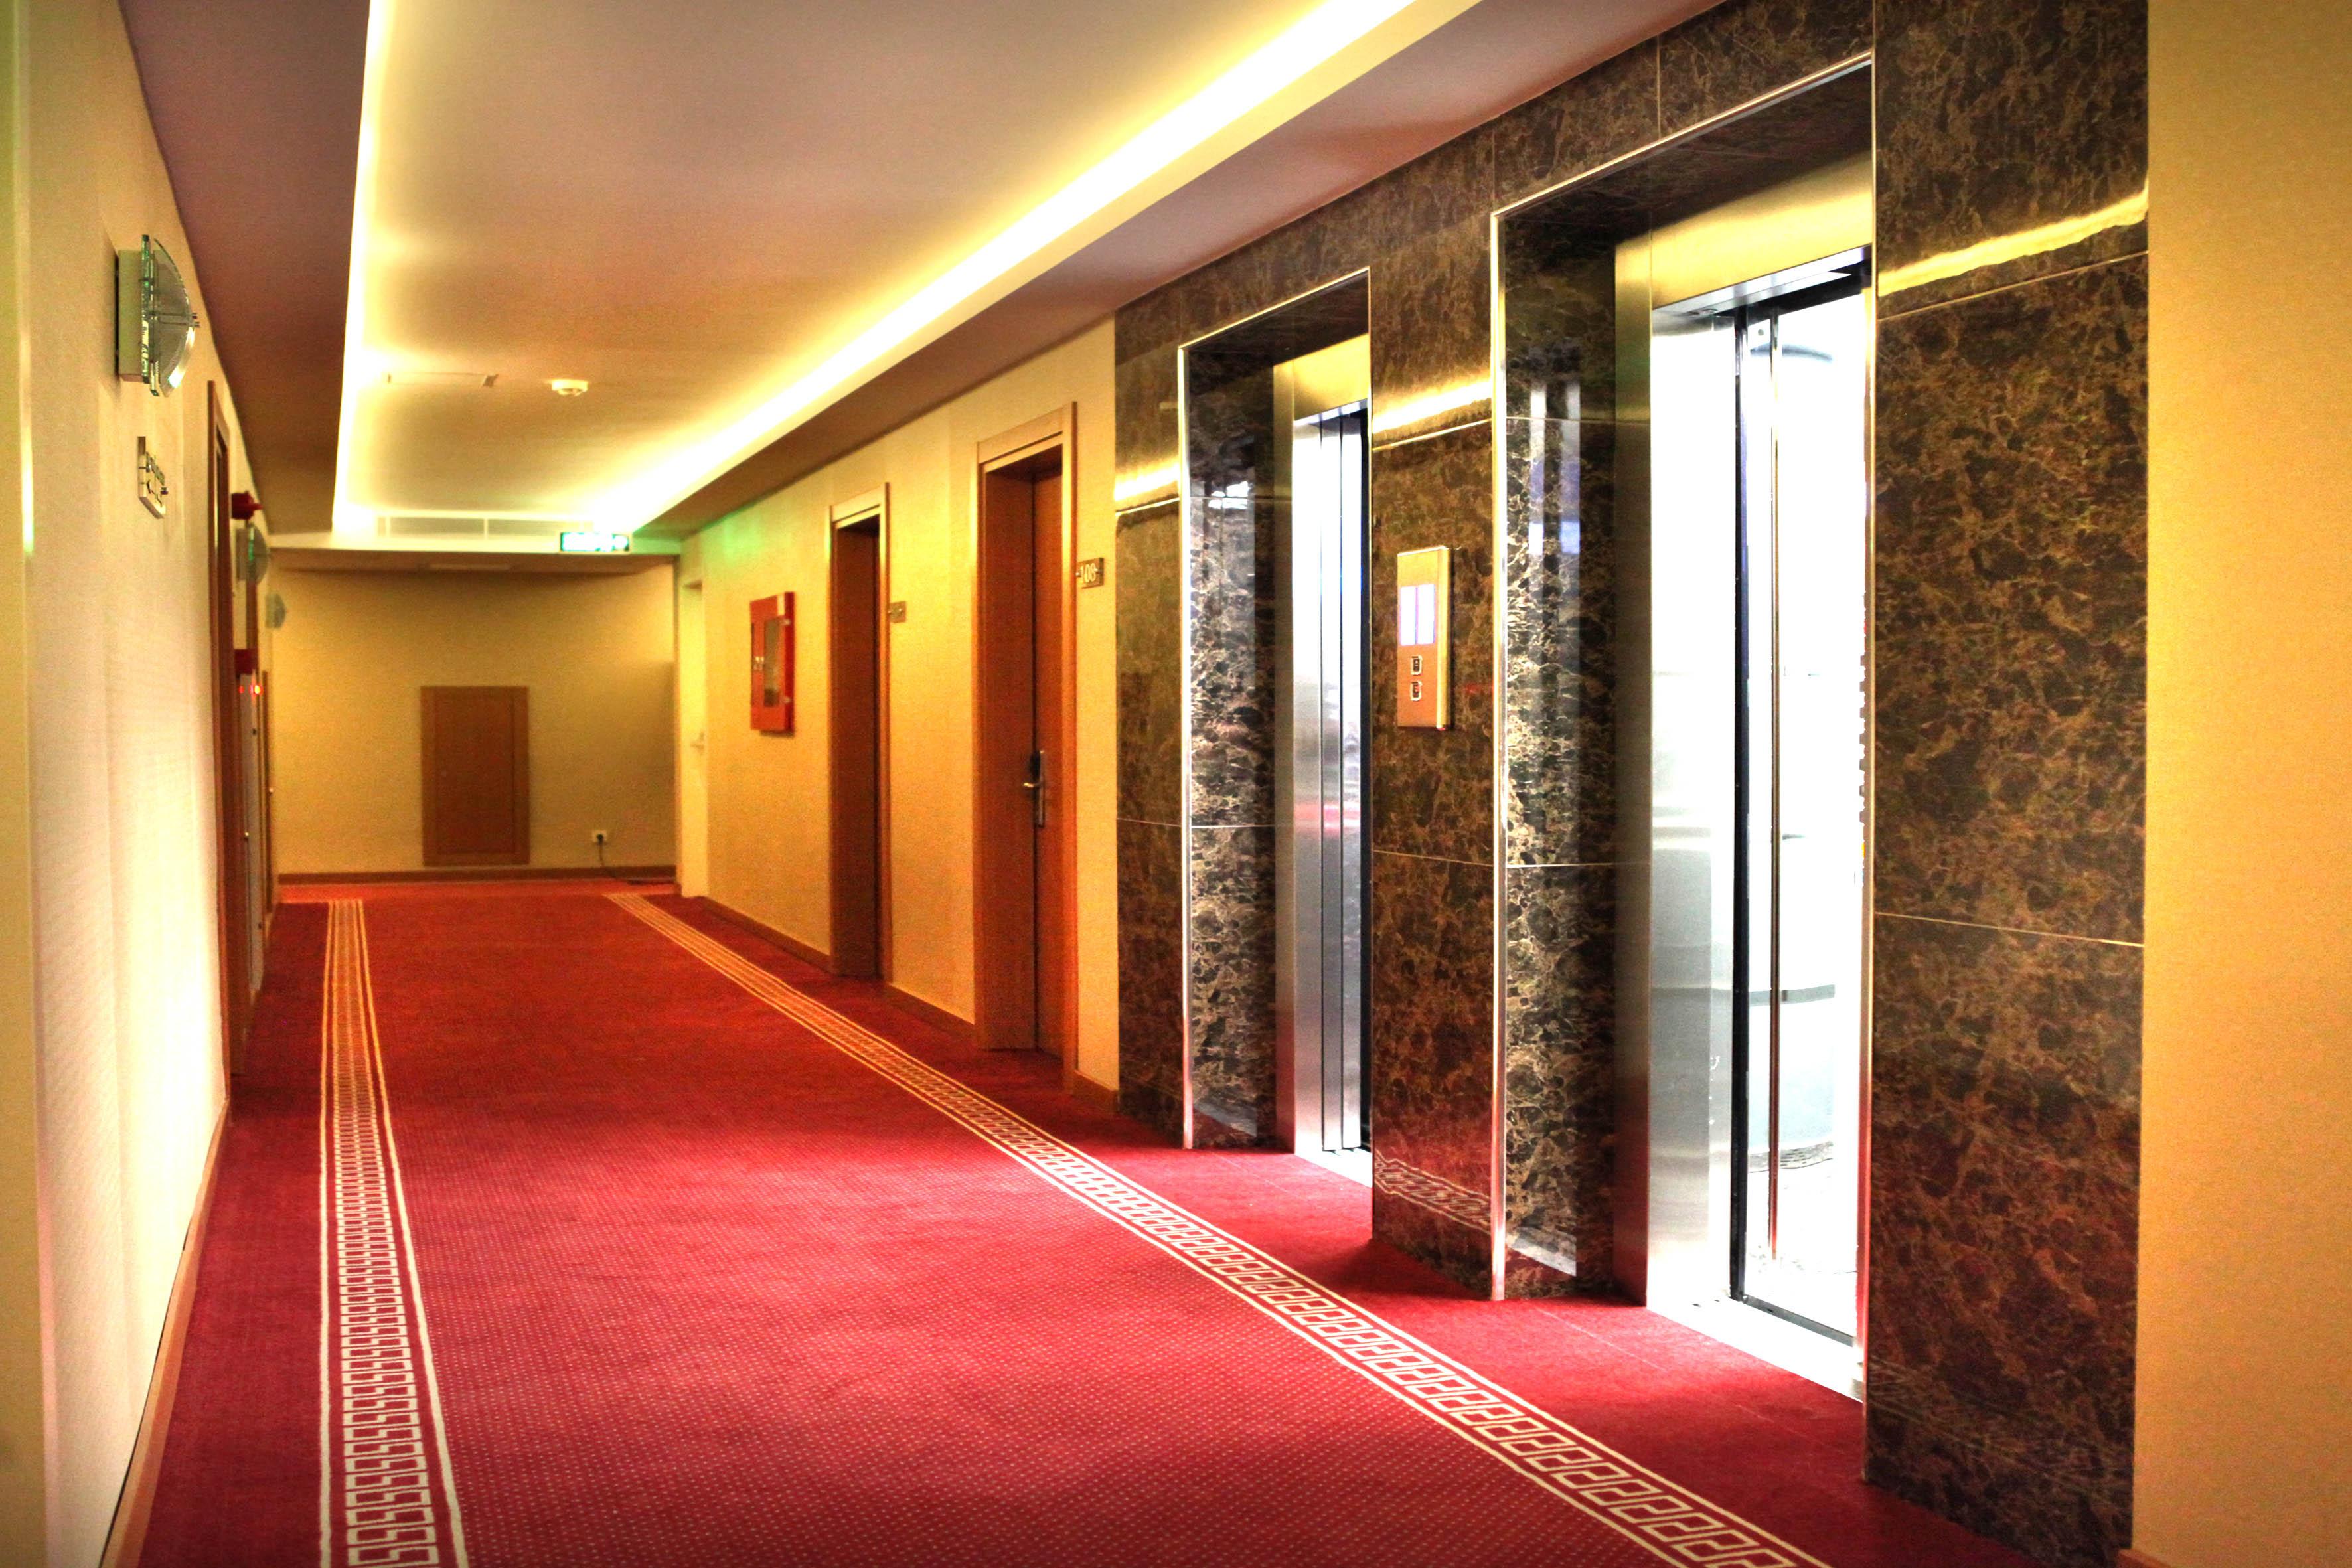 GRAND HOTEL AVCILAR8106